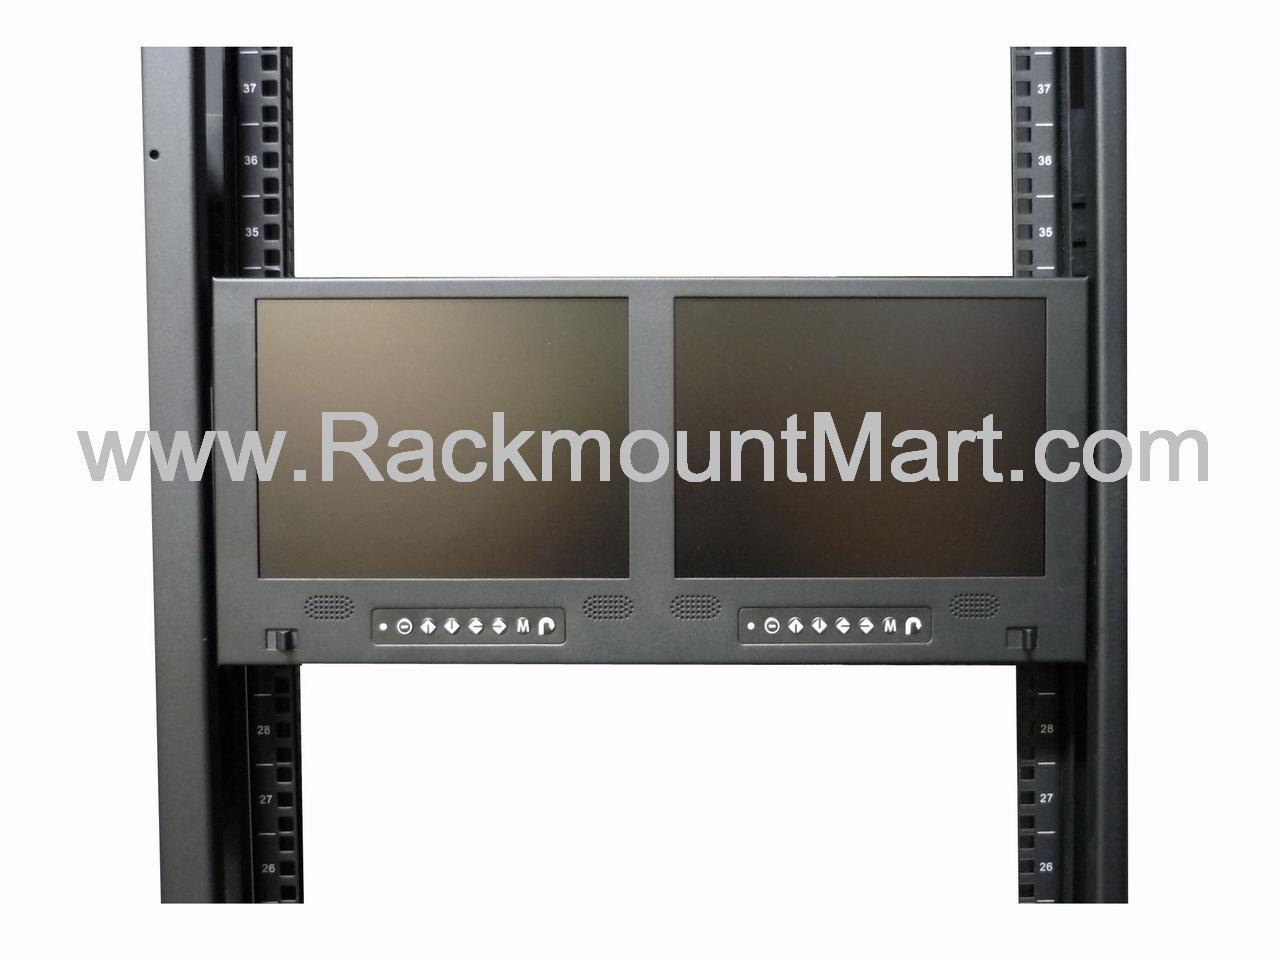 Rackmount Dual Lcd Led Monitor Dual Rack Mount Tft